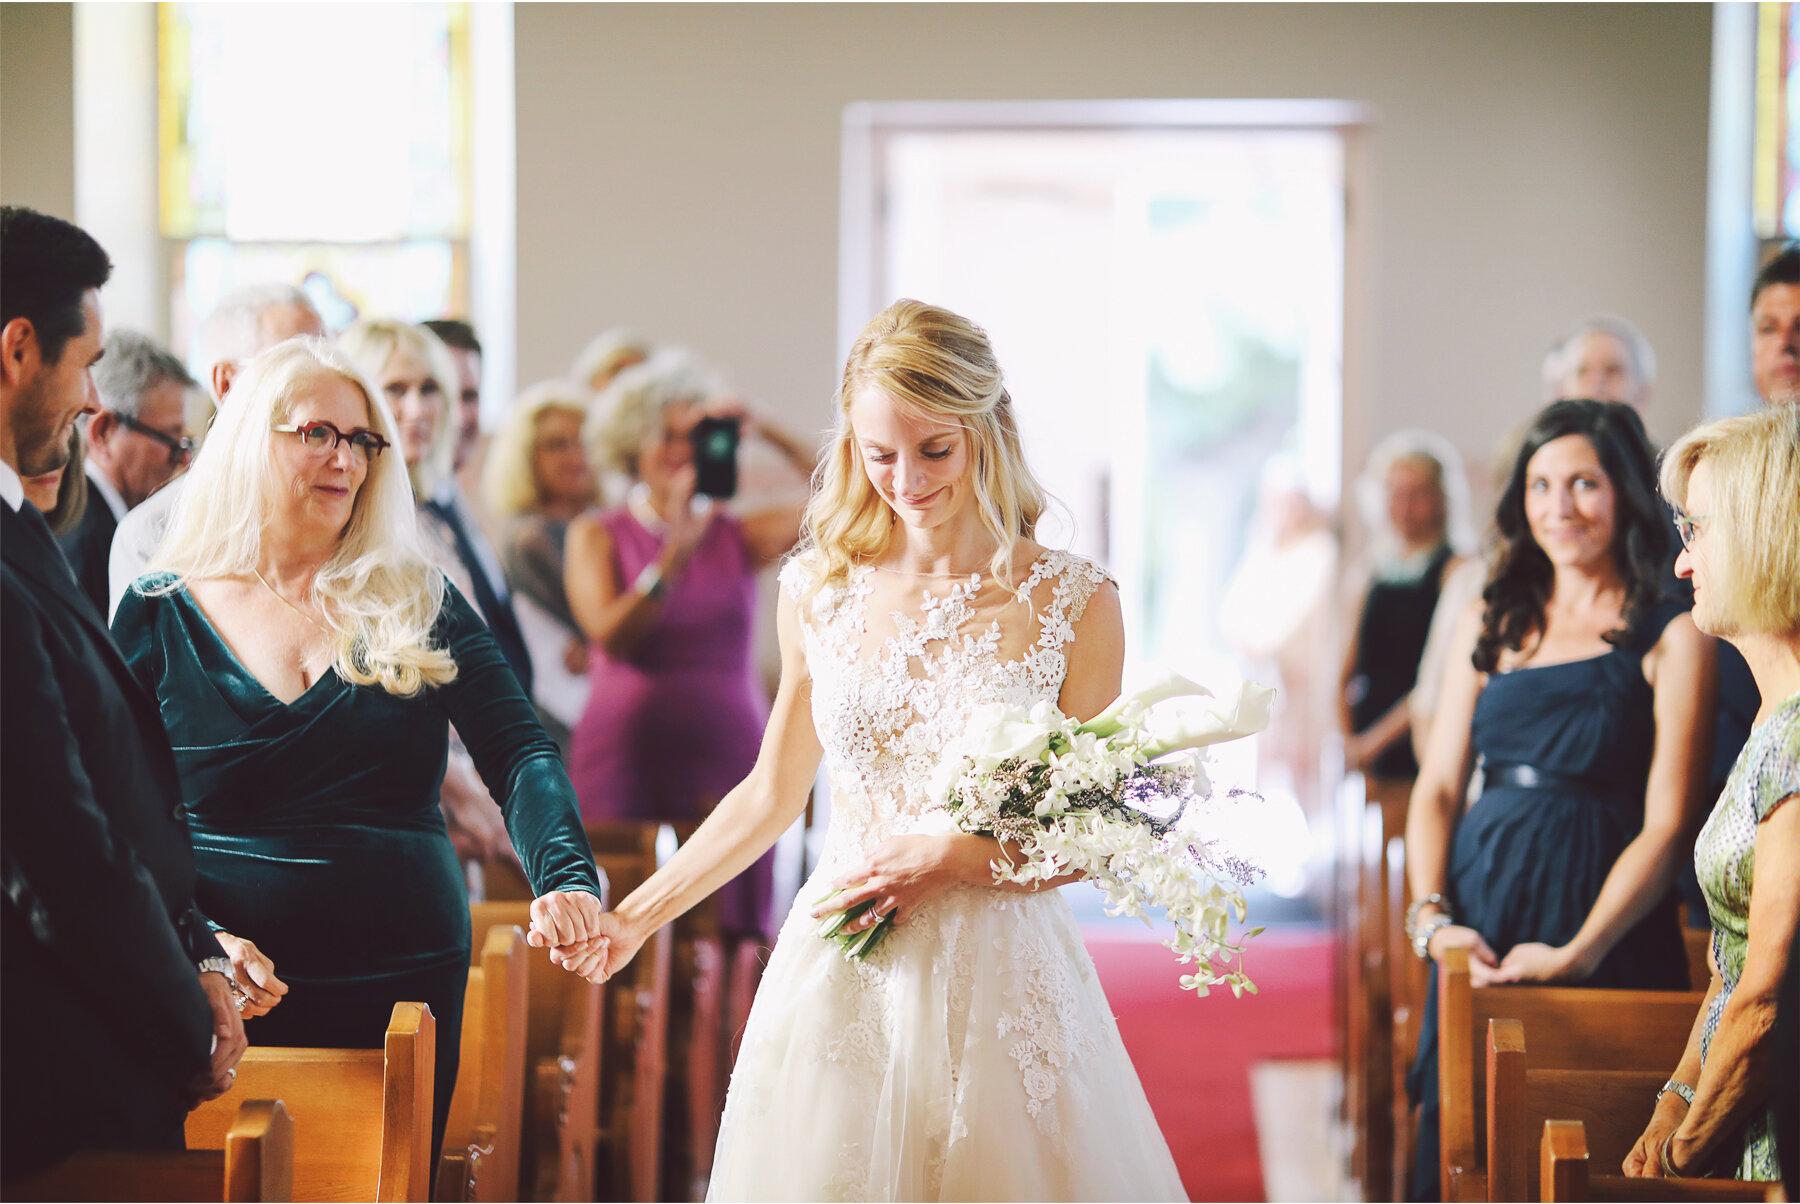 11 Wedding Vick Photography Minneapolis Minnesota Ceremony St Peters Mendota Bride Support Michelle and William.jpg